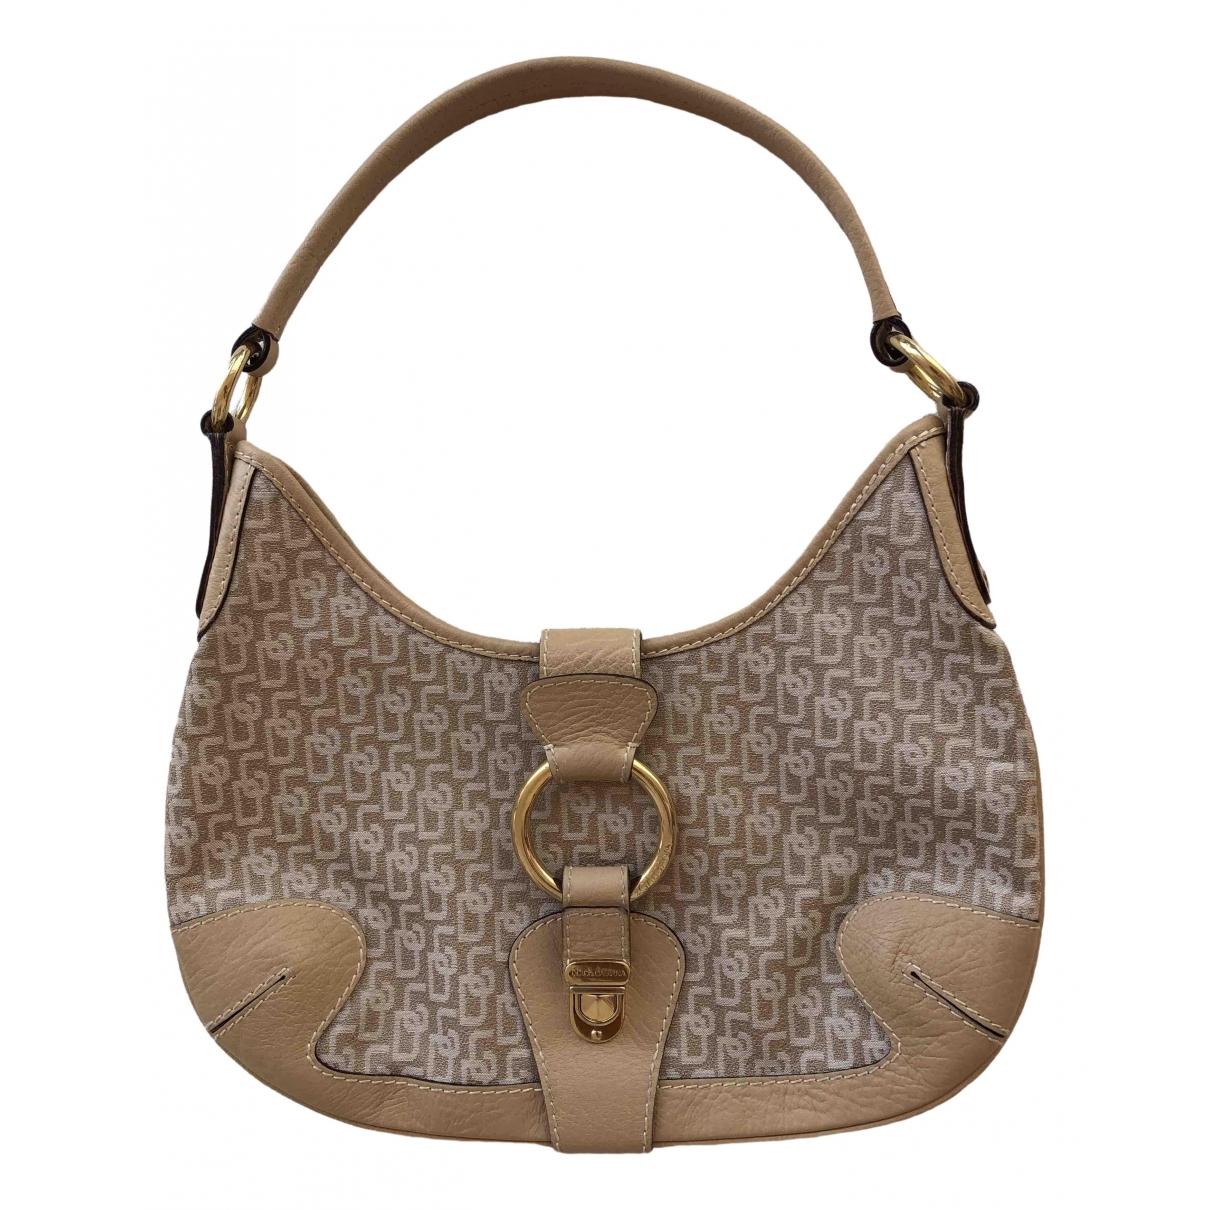 Dolce & Gabbana \N Beige Cloth handbag for Women \N